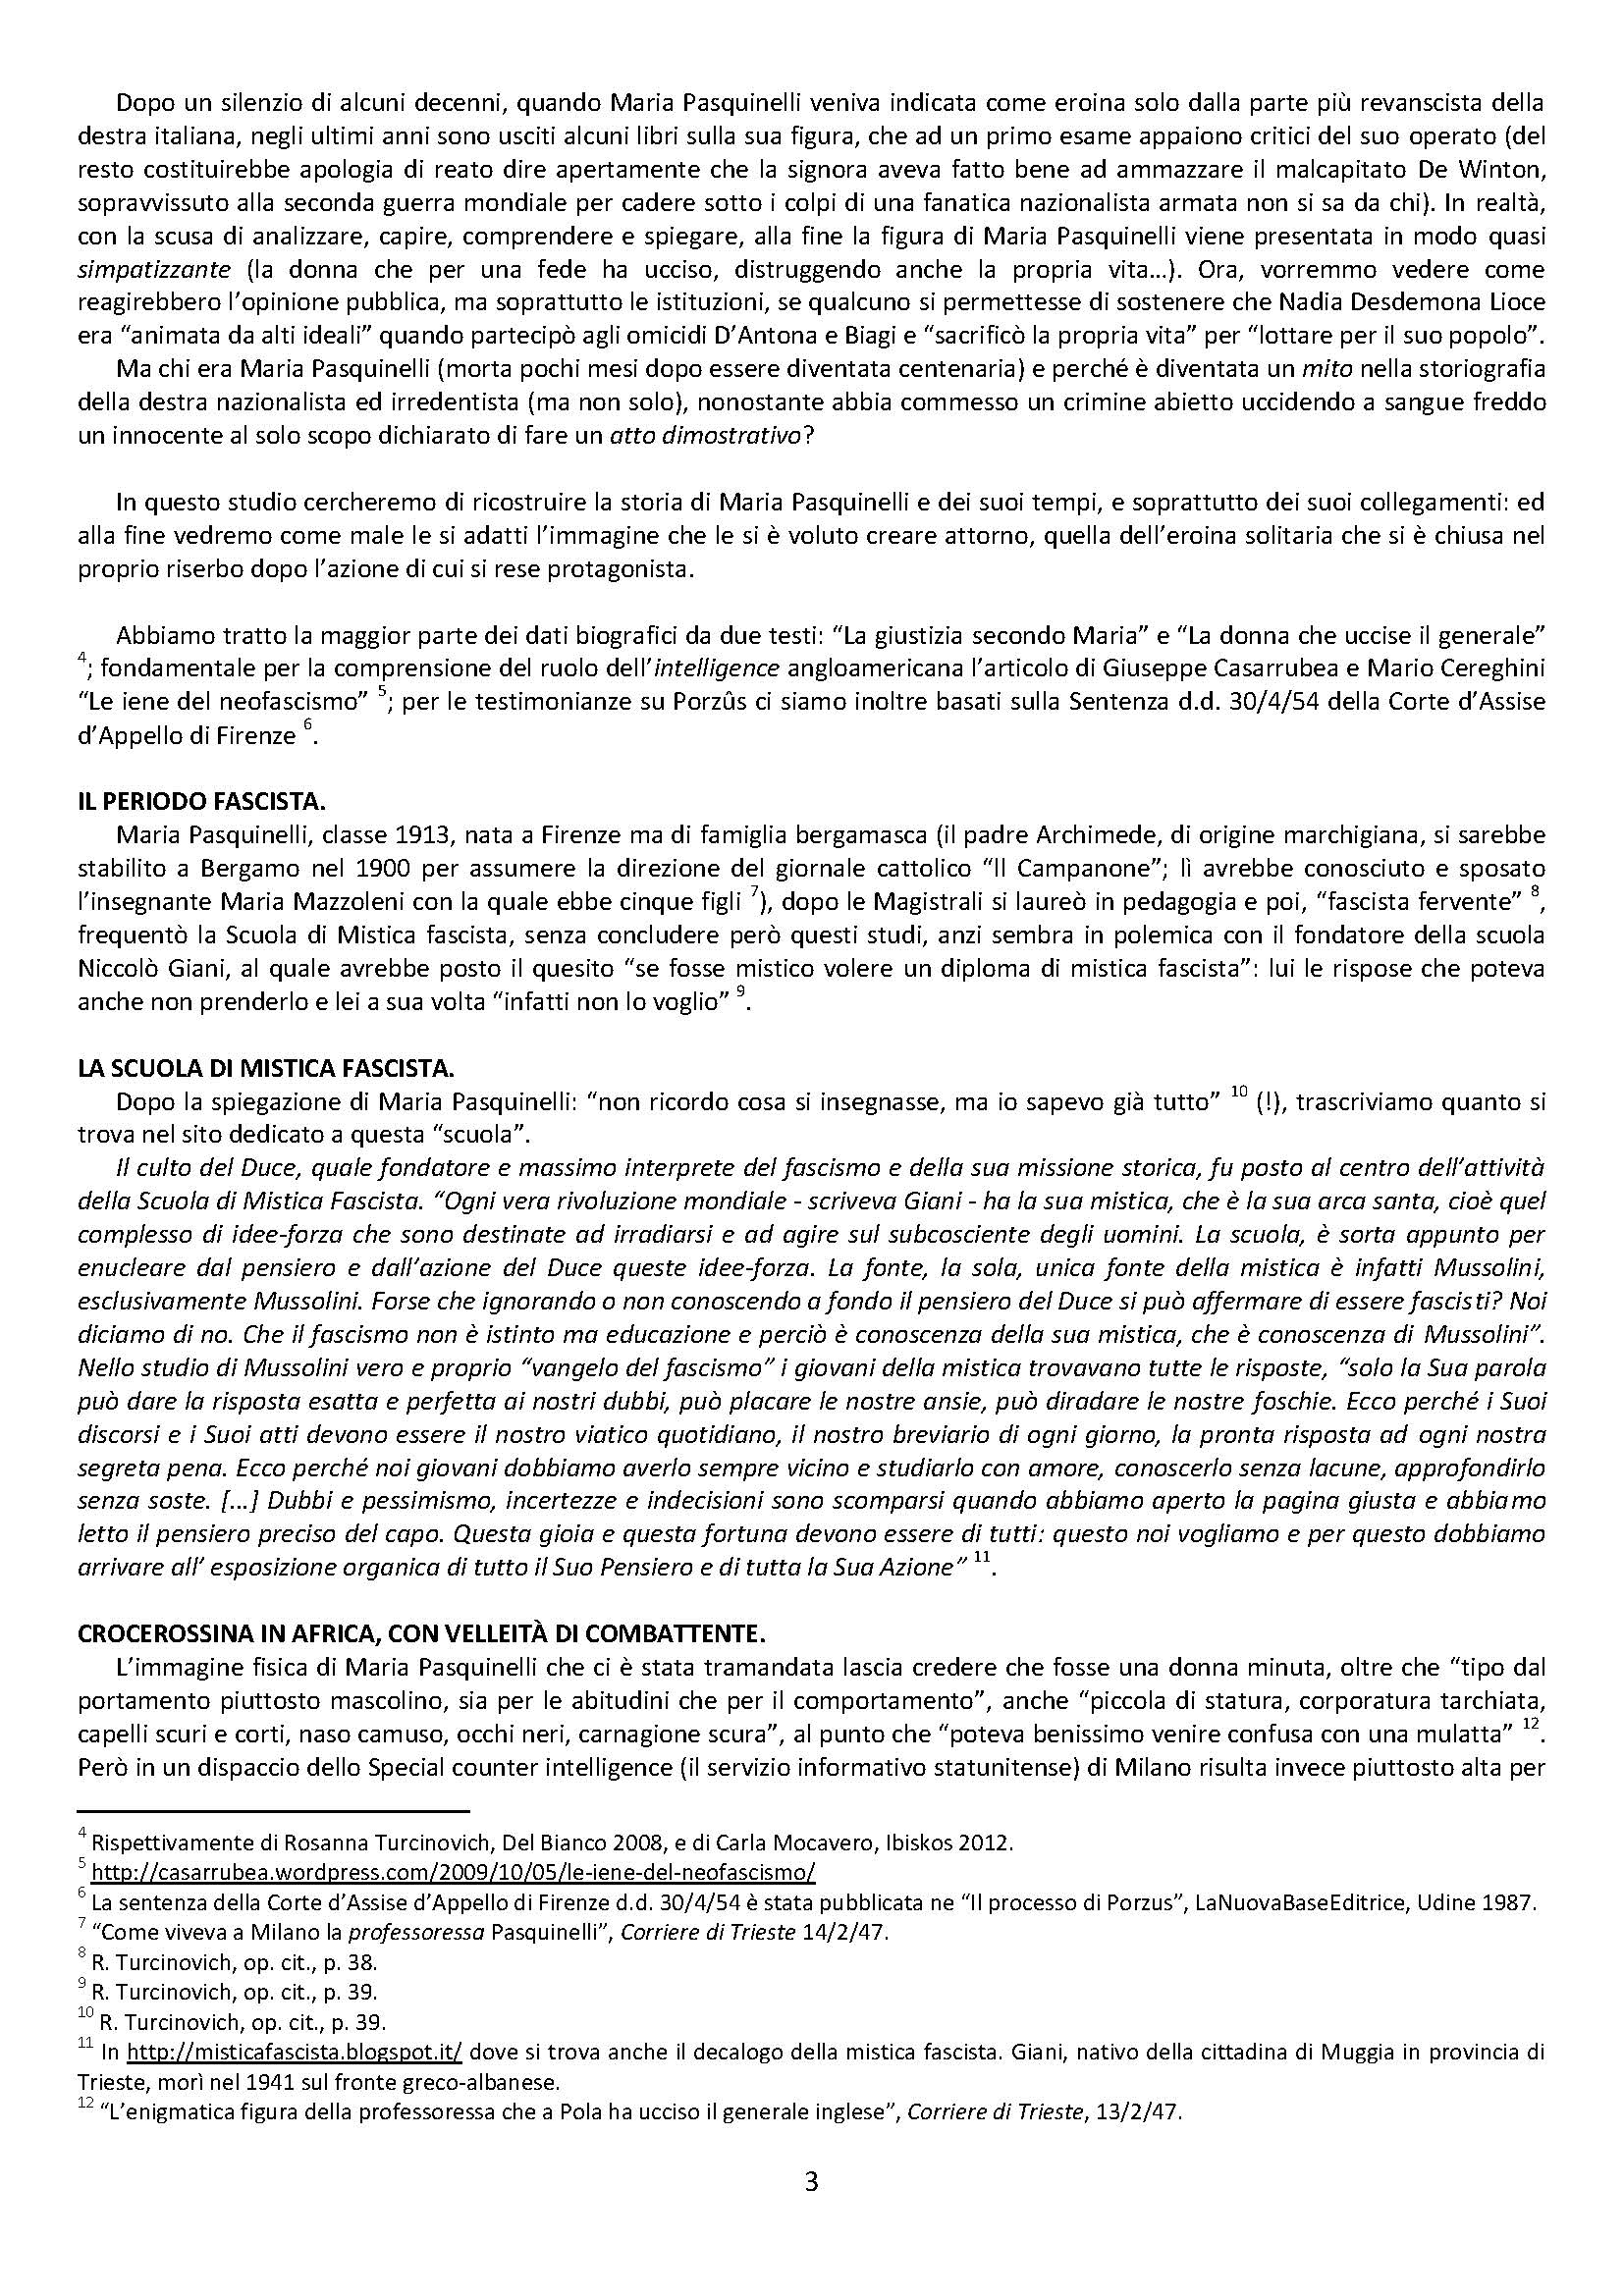 dossier-maria-pasquinelli_Page_03